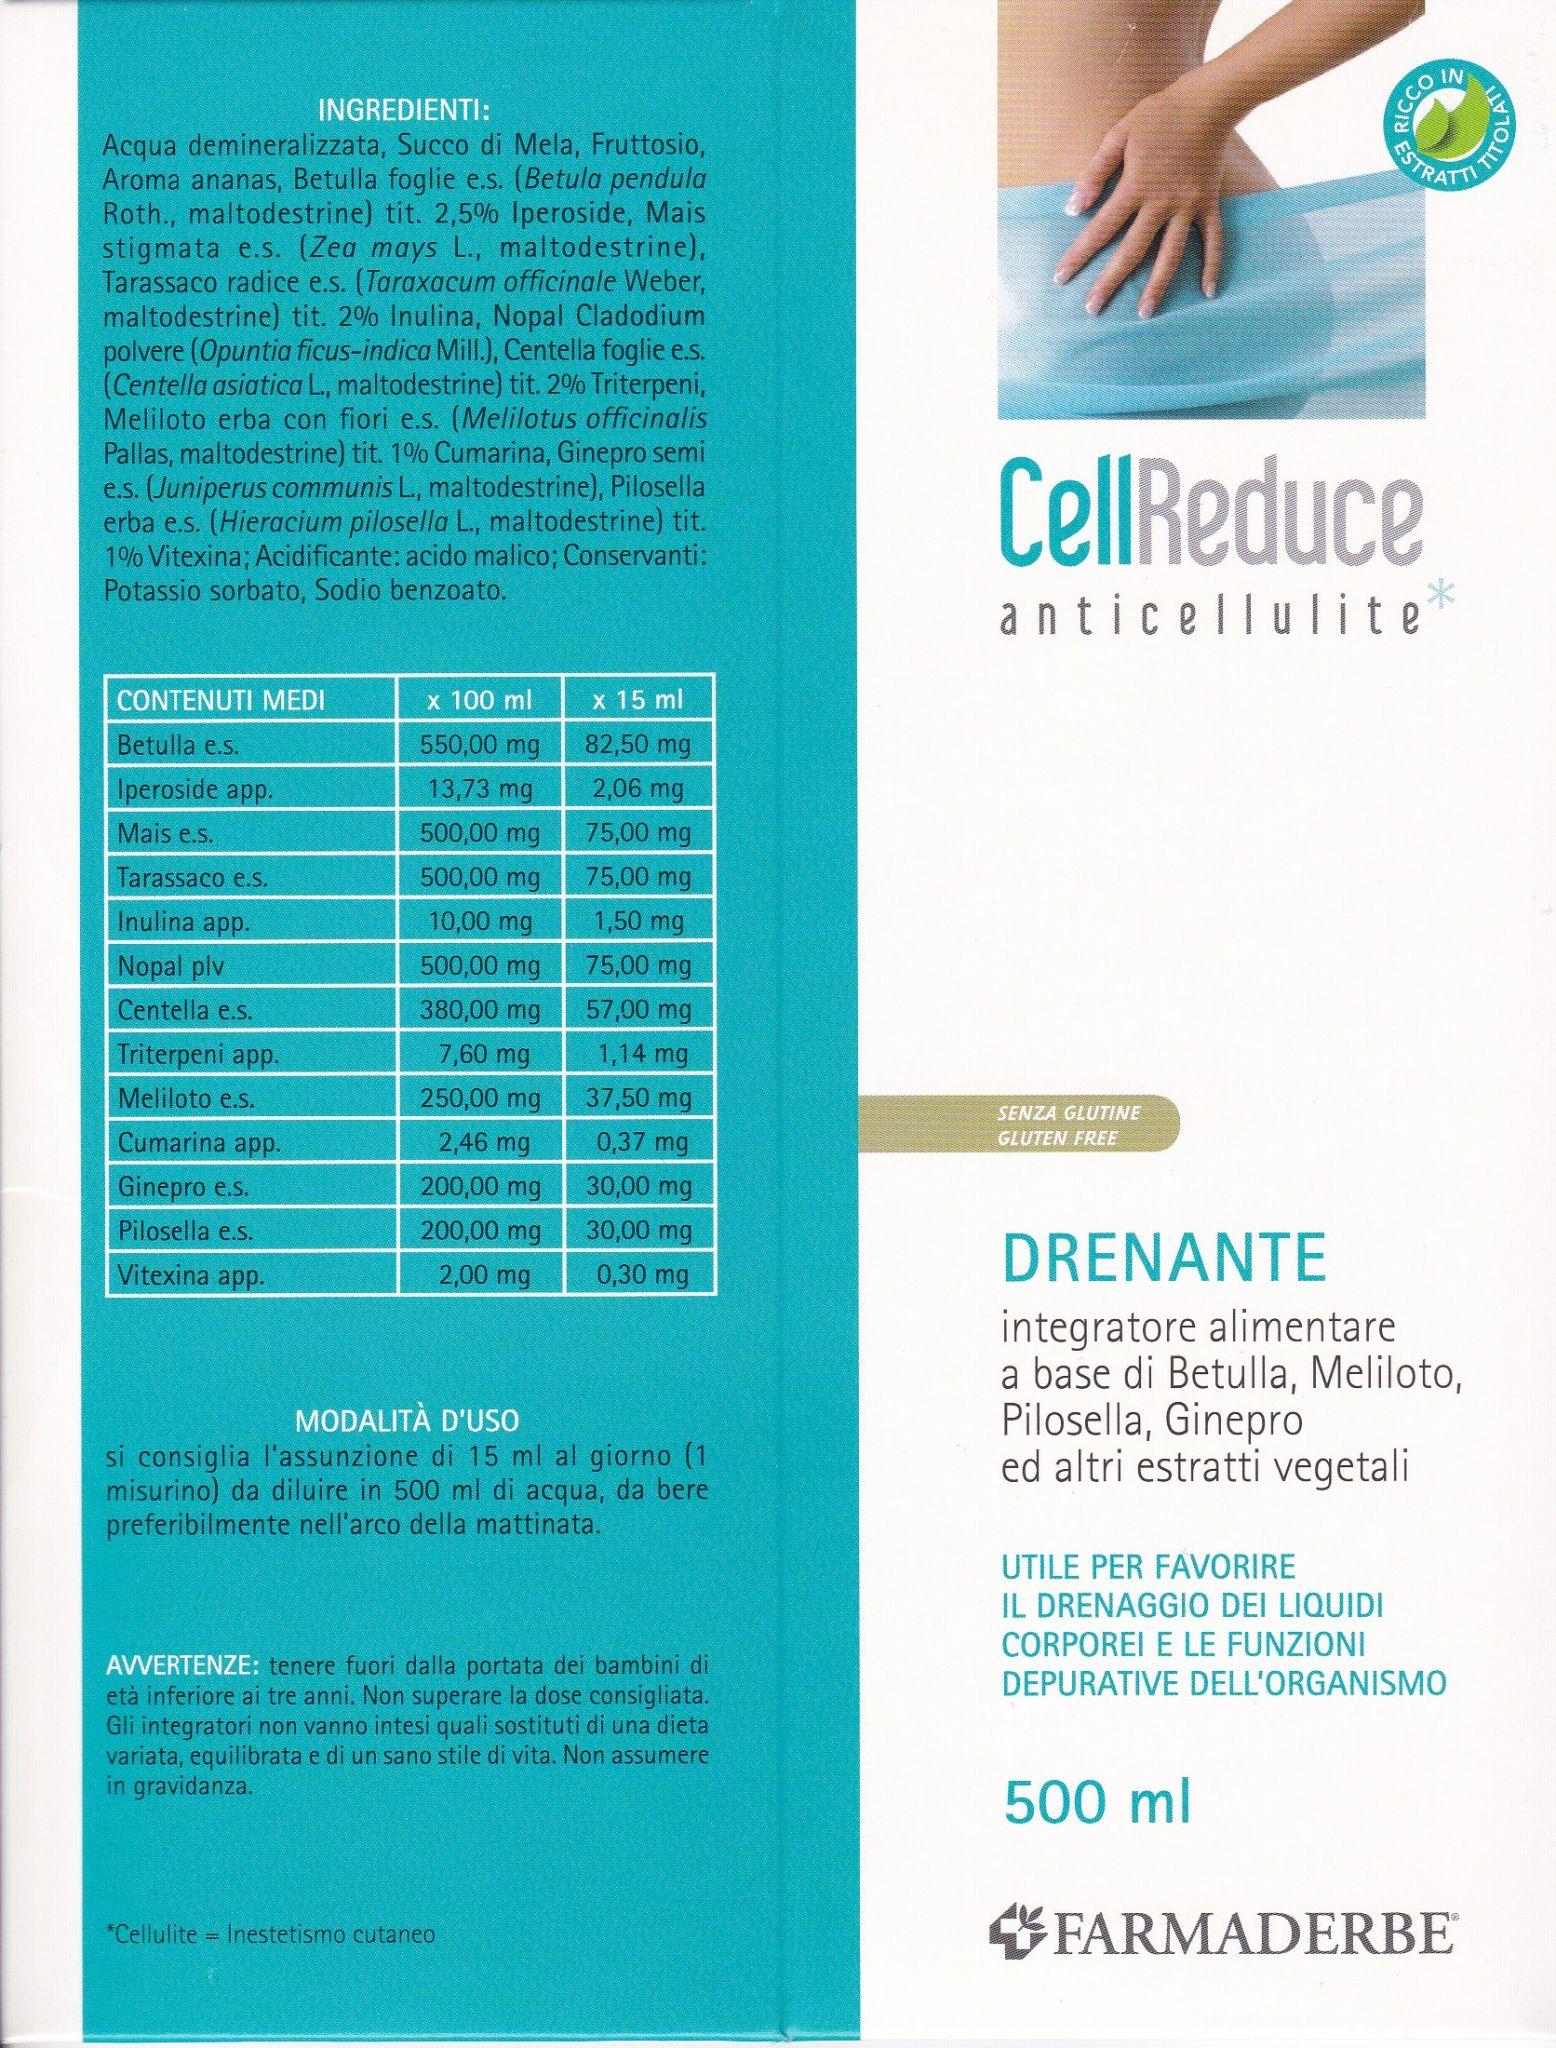 CELL drenante  REDUCE anticellulite  500 ml- FARMADERBE